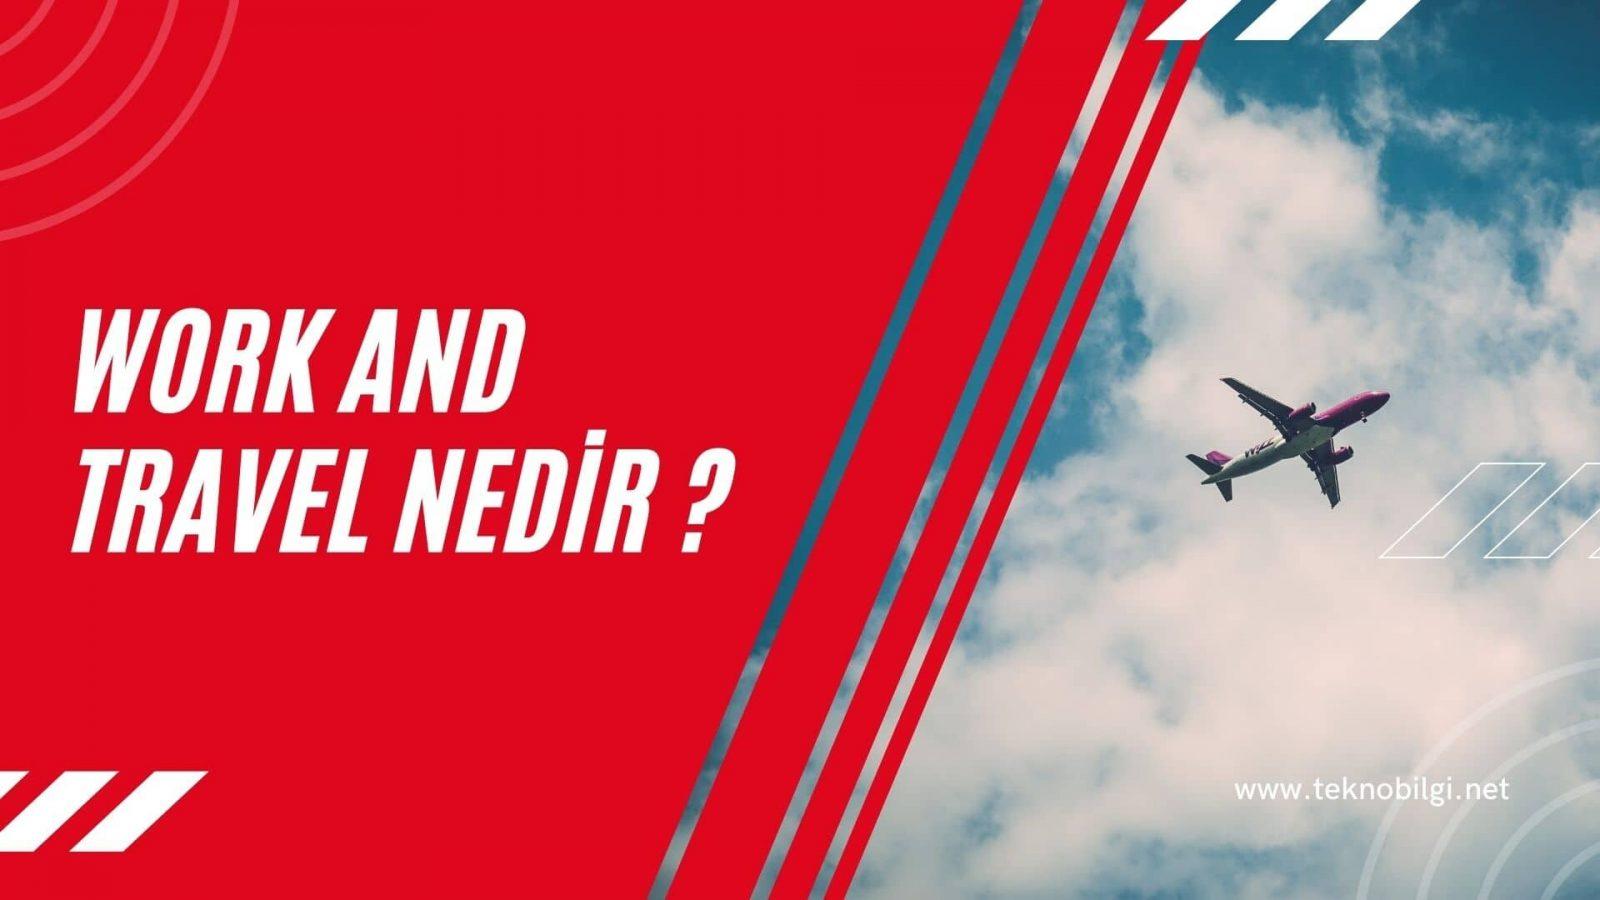 Work and Travel Nedir, Work and Travel Nedir ?